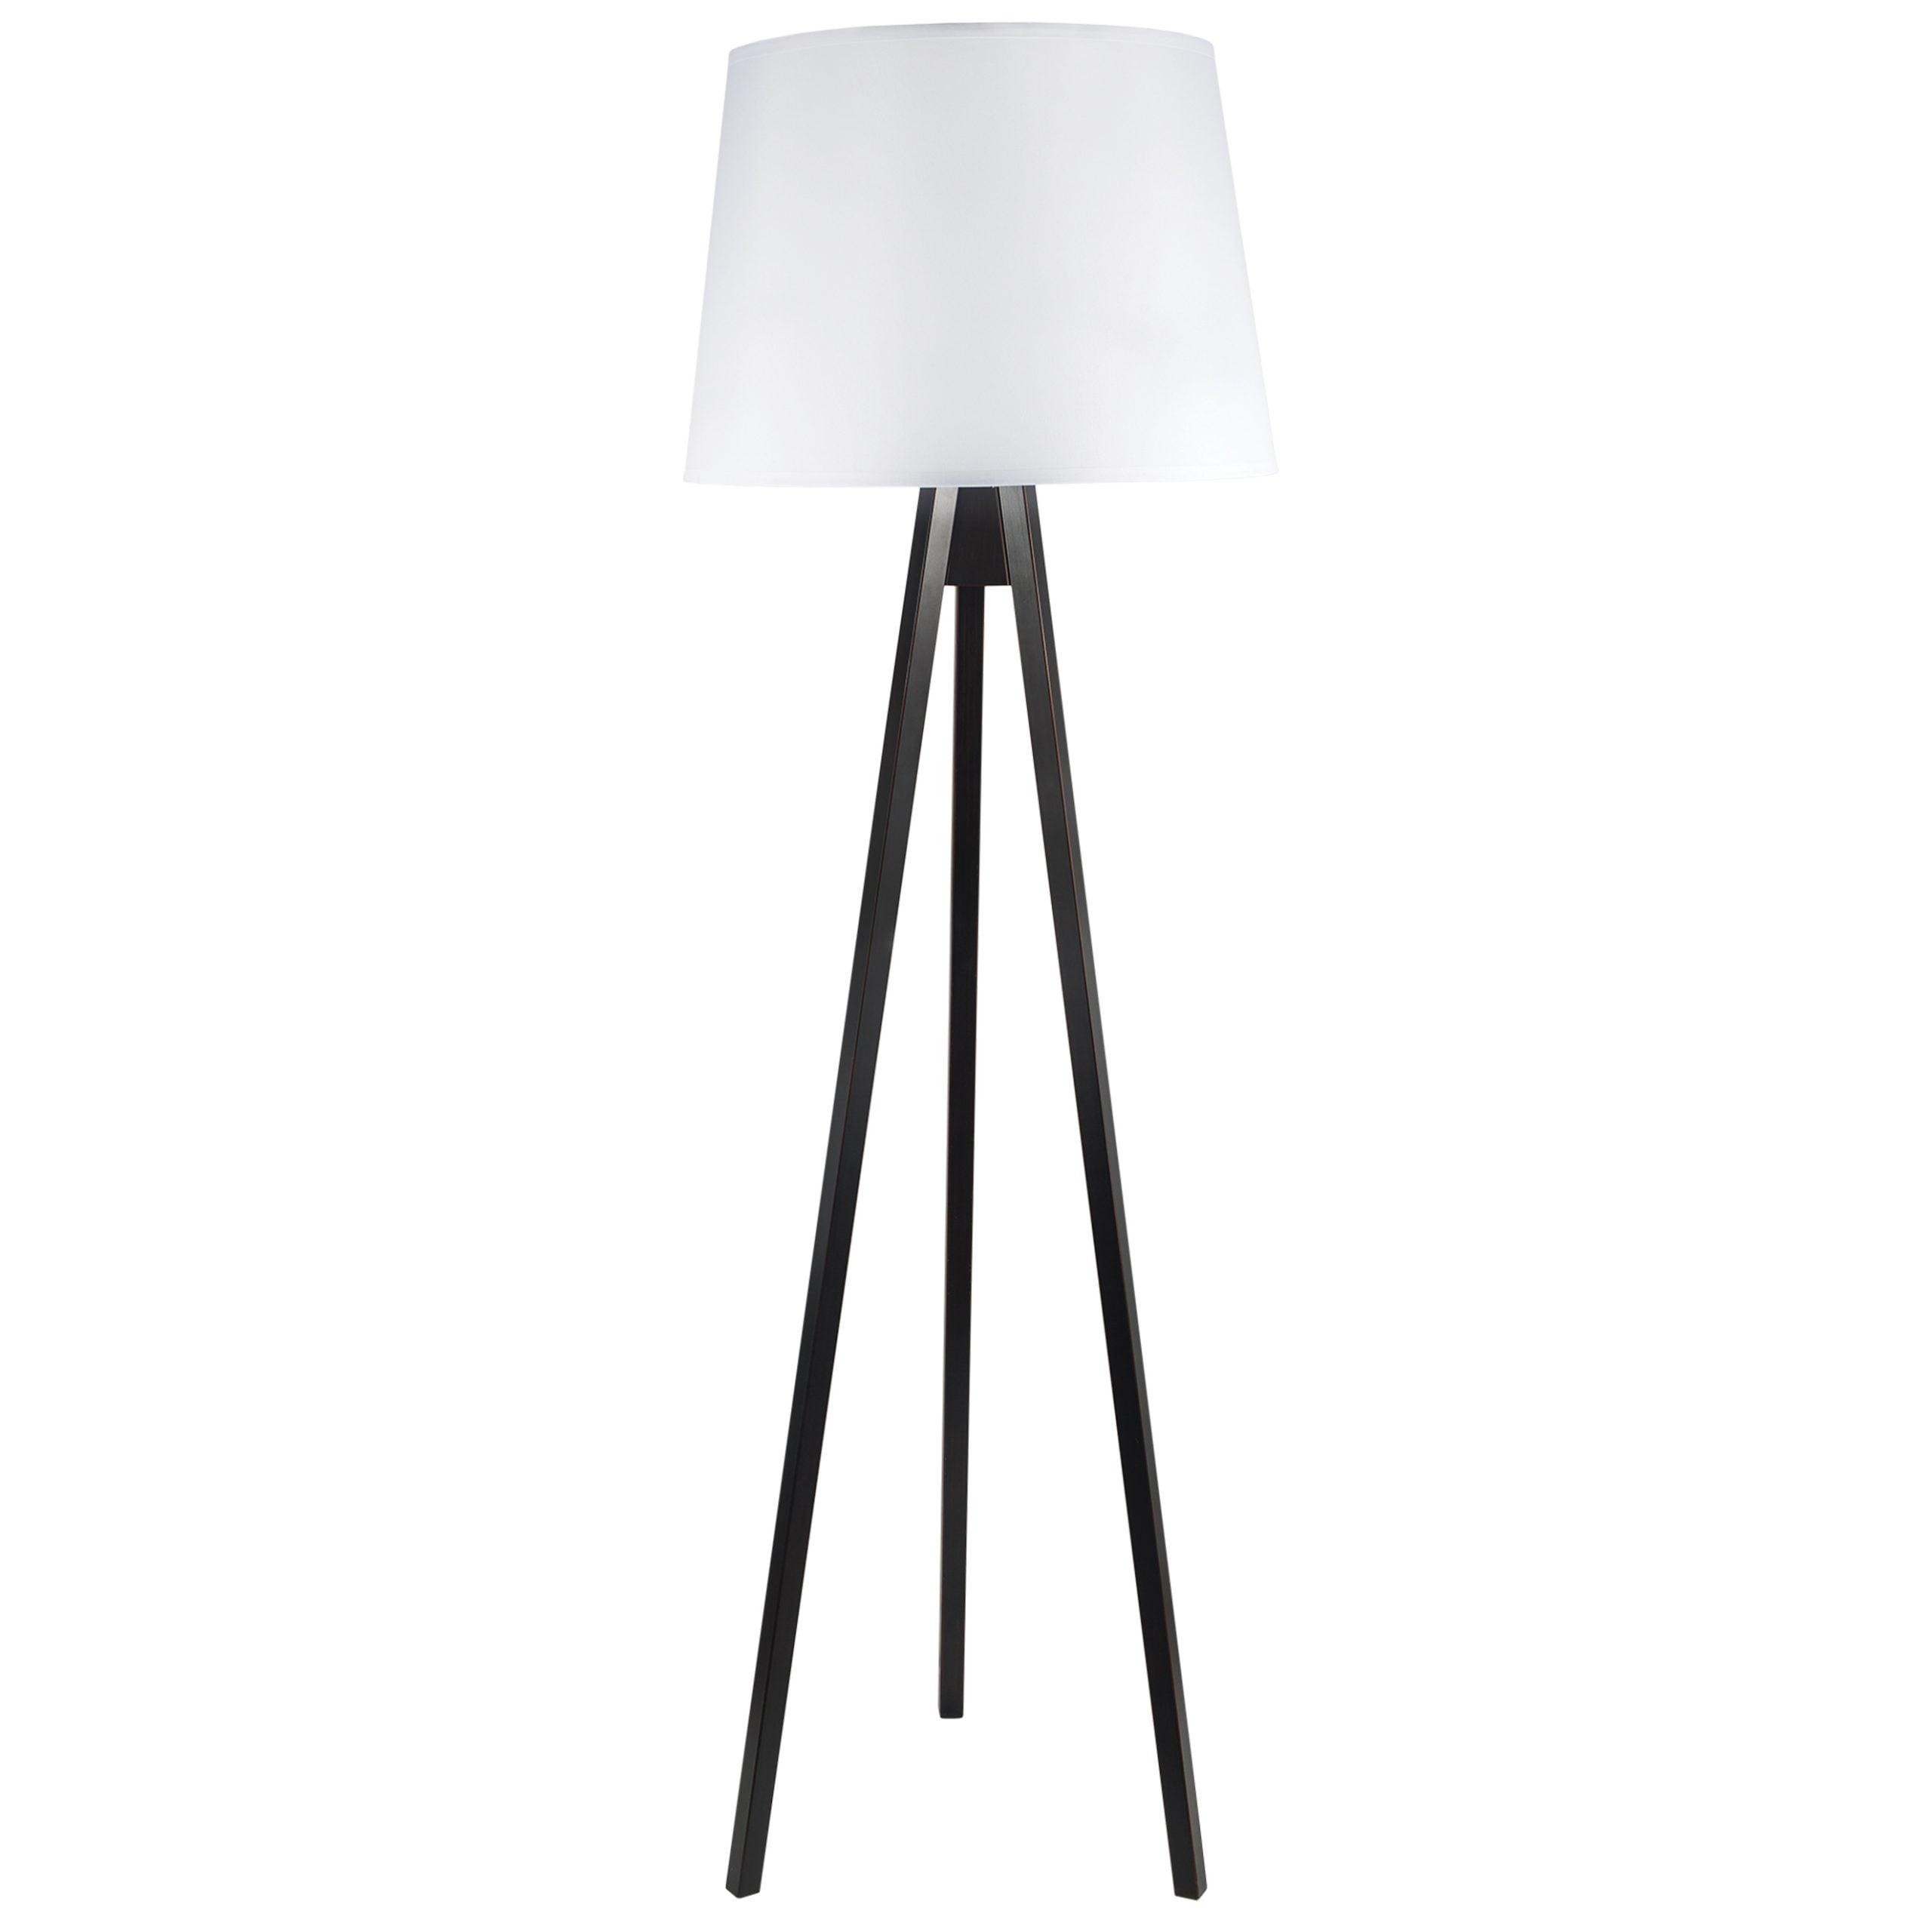 Lobby Tripod Floor Lamp